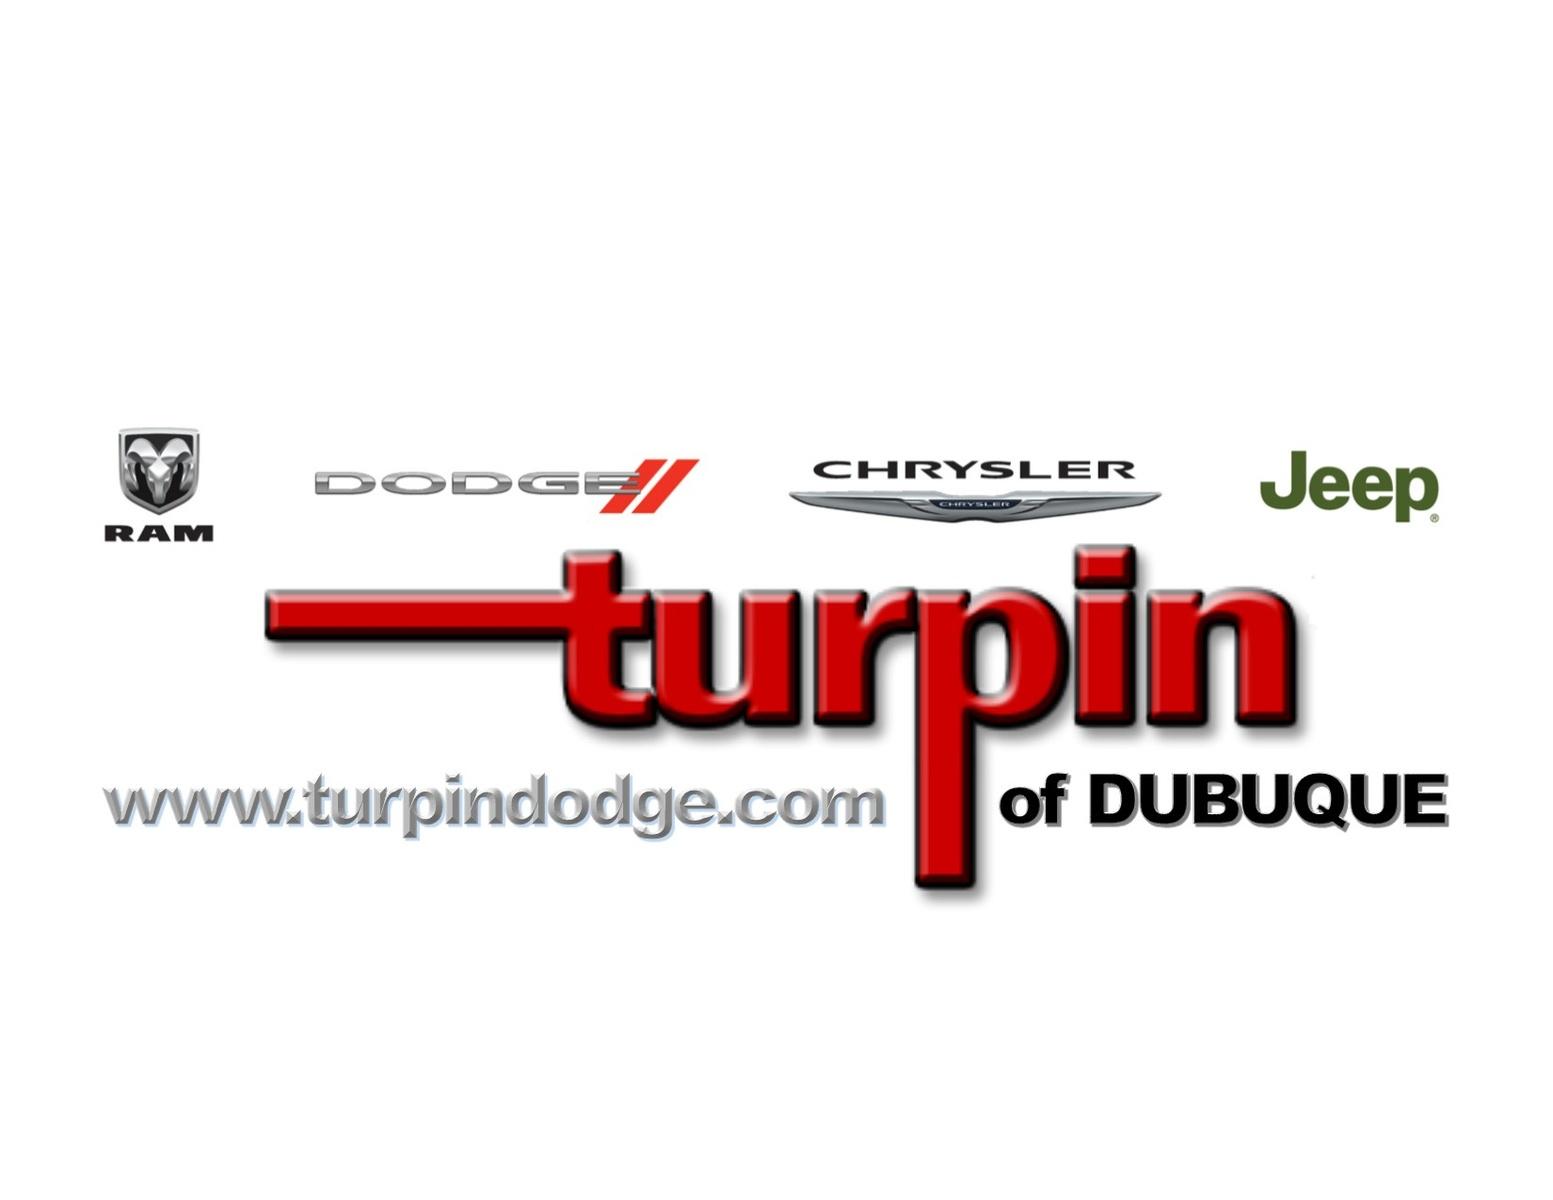 Turpin Dodge Dubuque >> Turpin Dodge Chrysler Jeep Ram Dubuque Ia Read Consumer